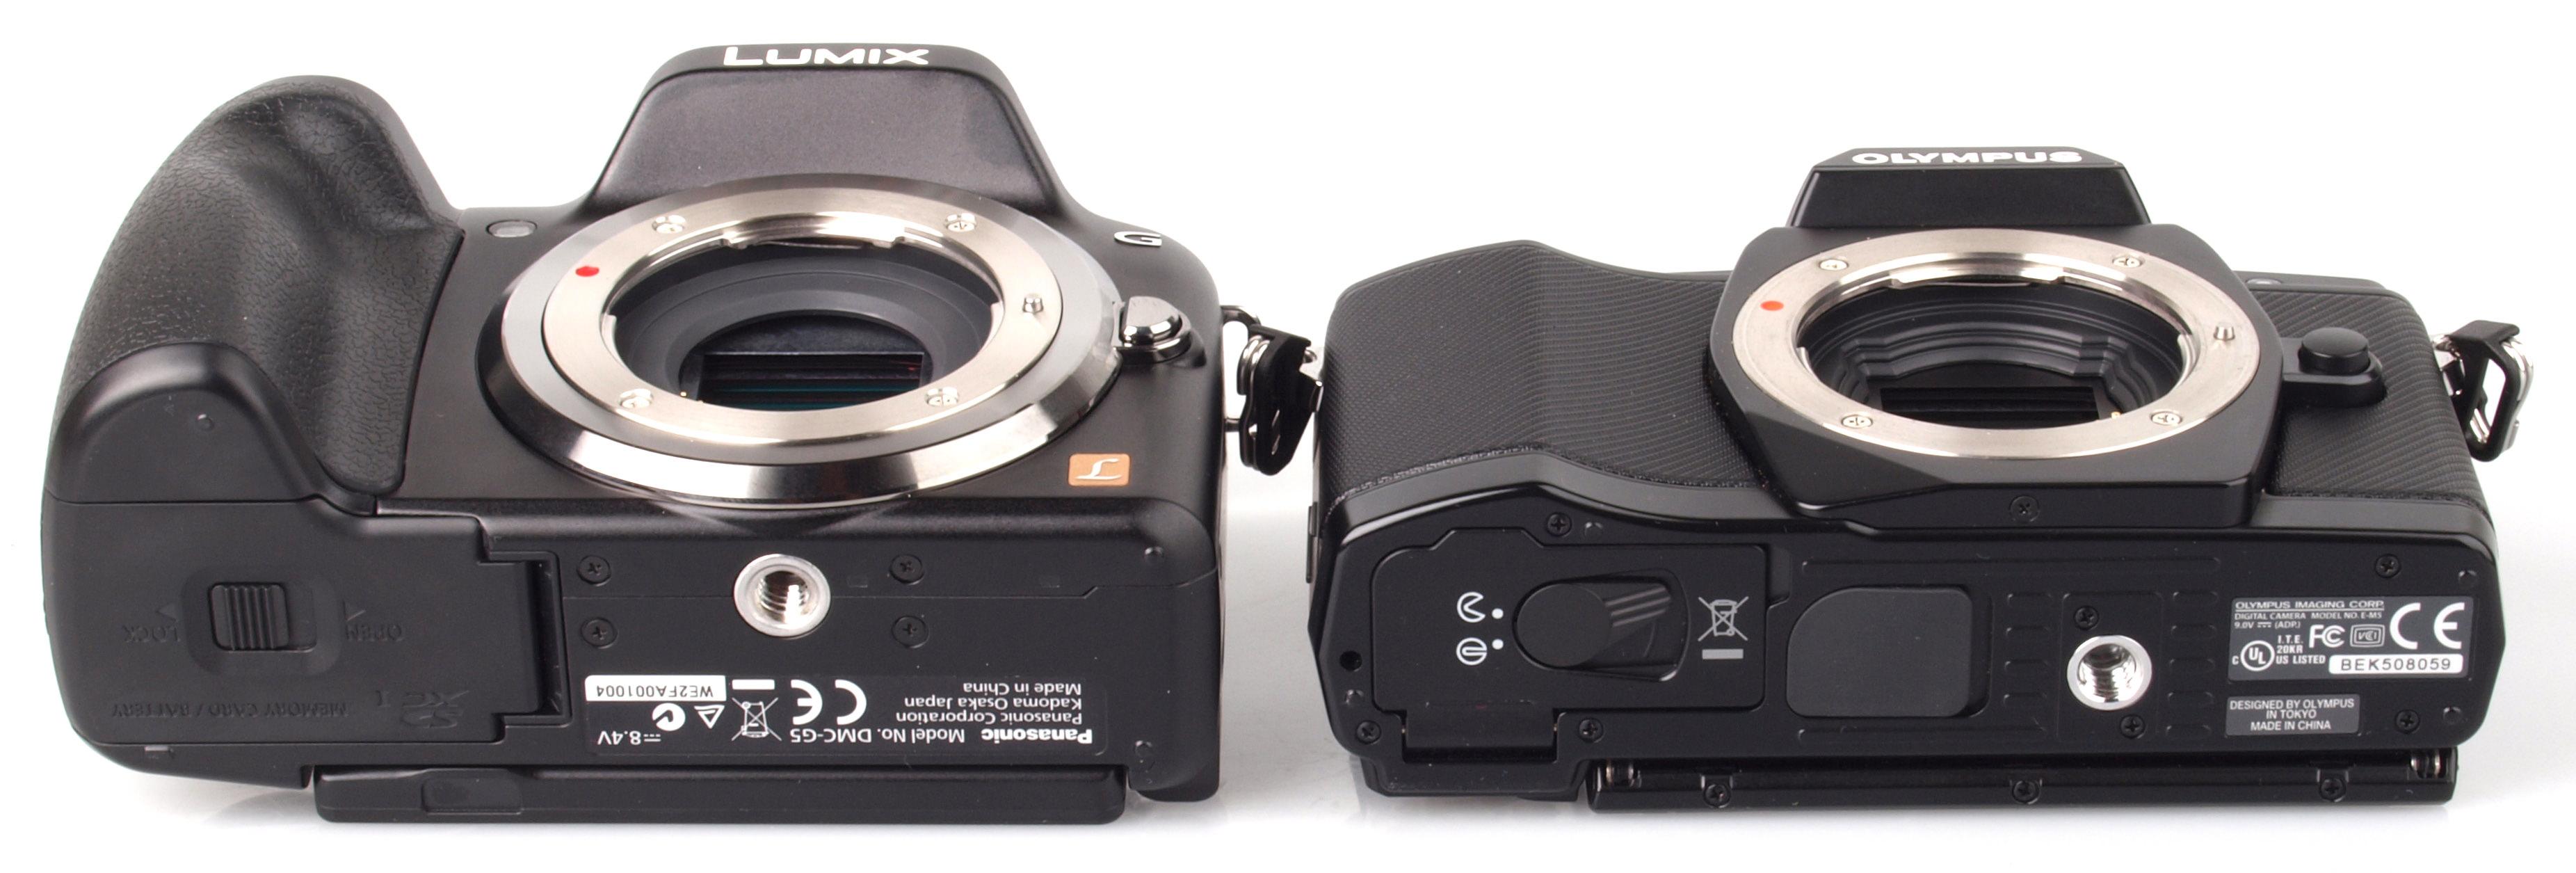 Panasonic Lumix G5 vs Olympus OM-D E-M5 Review .